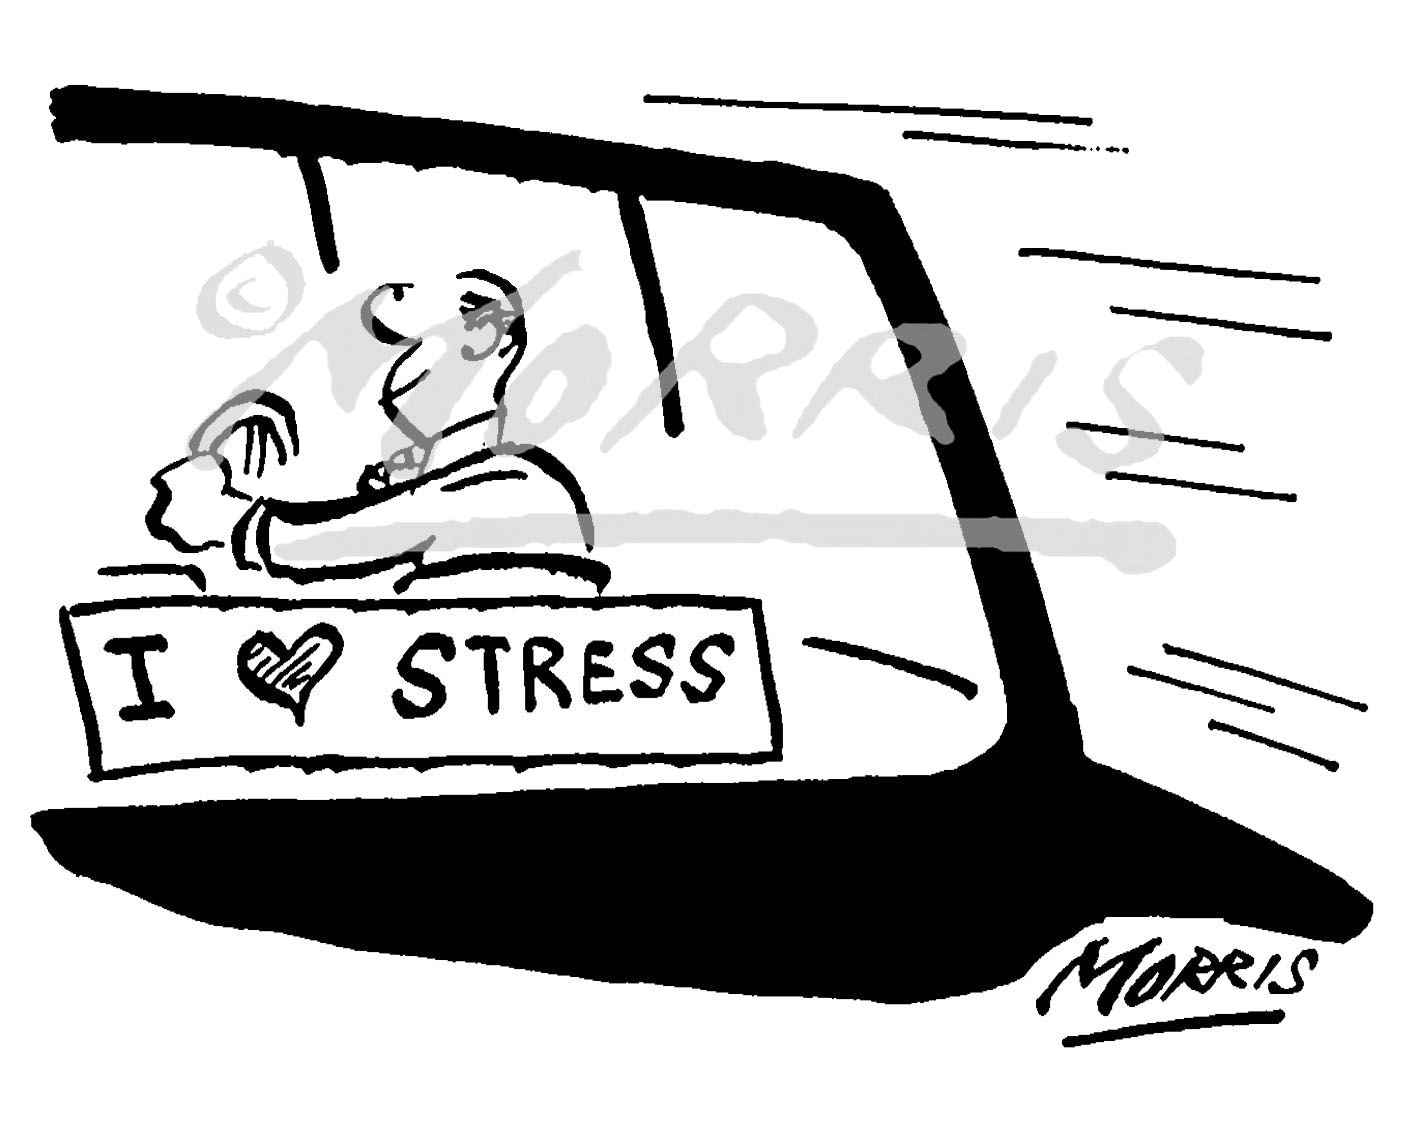 Stress cartoon Ref: 0855bw